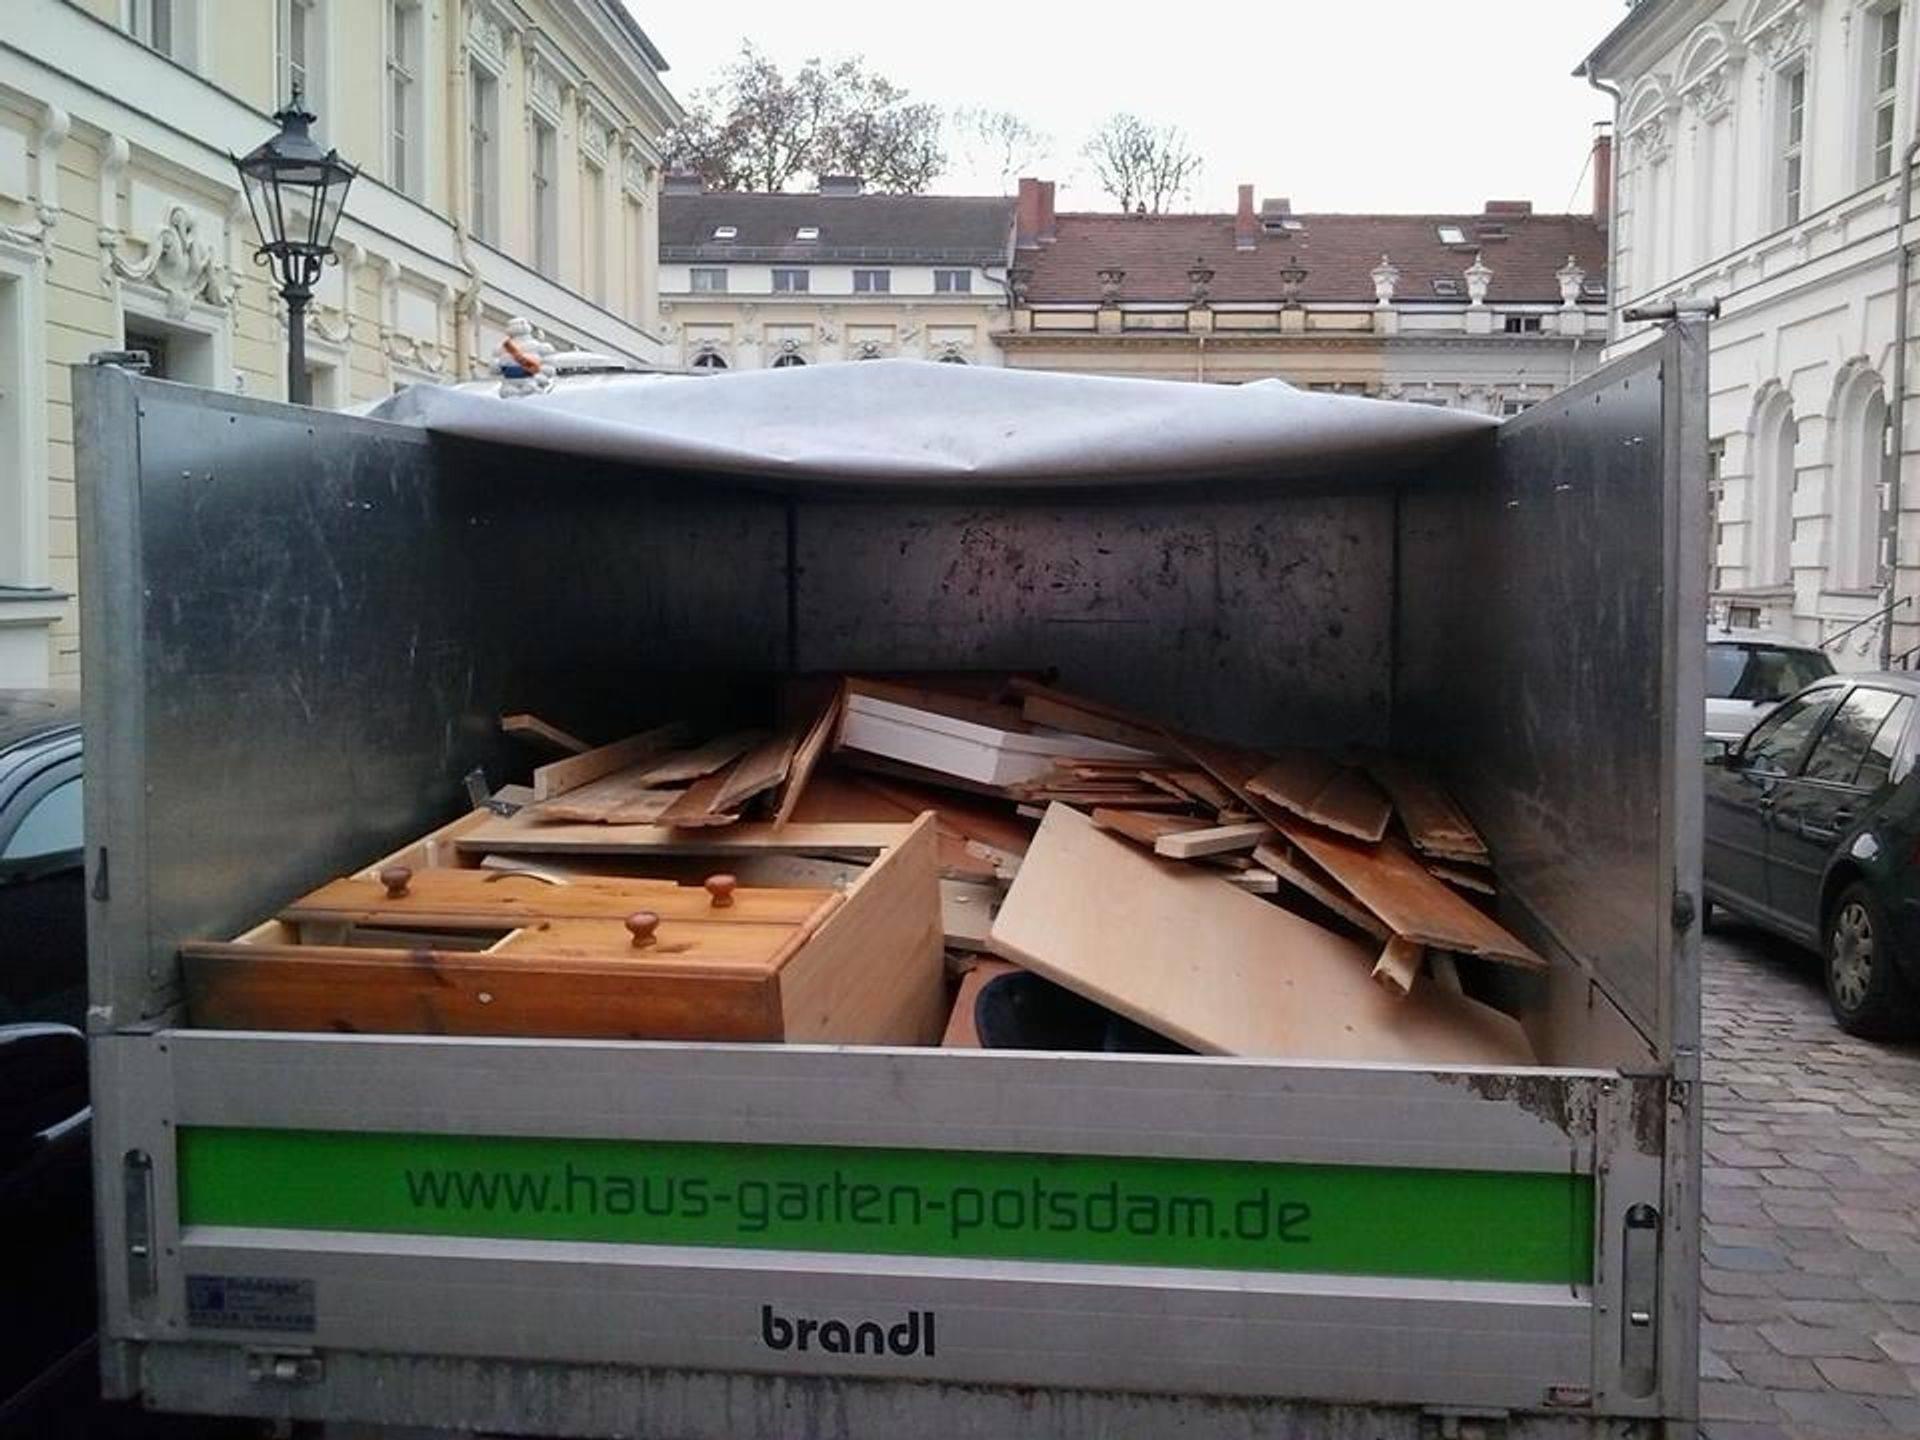 Entsorgung Holz behandelt Potsdam, Berlin, Kleinmachnow, Teltow, Werder / Havel, Falkensee, Nuthetal, Ludwigsfelde, Beelitz